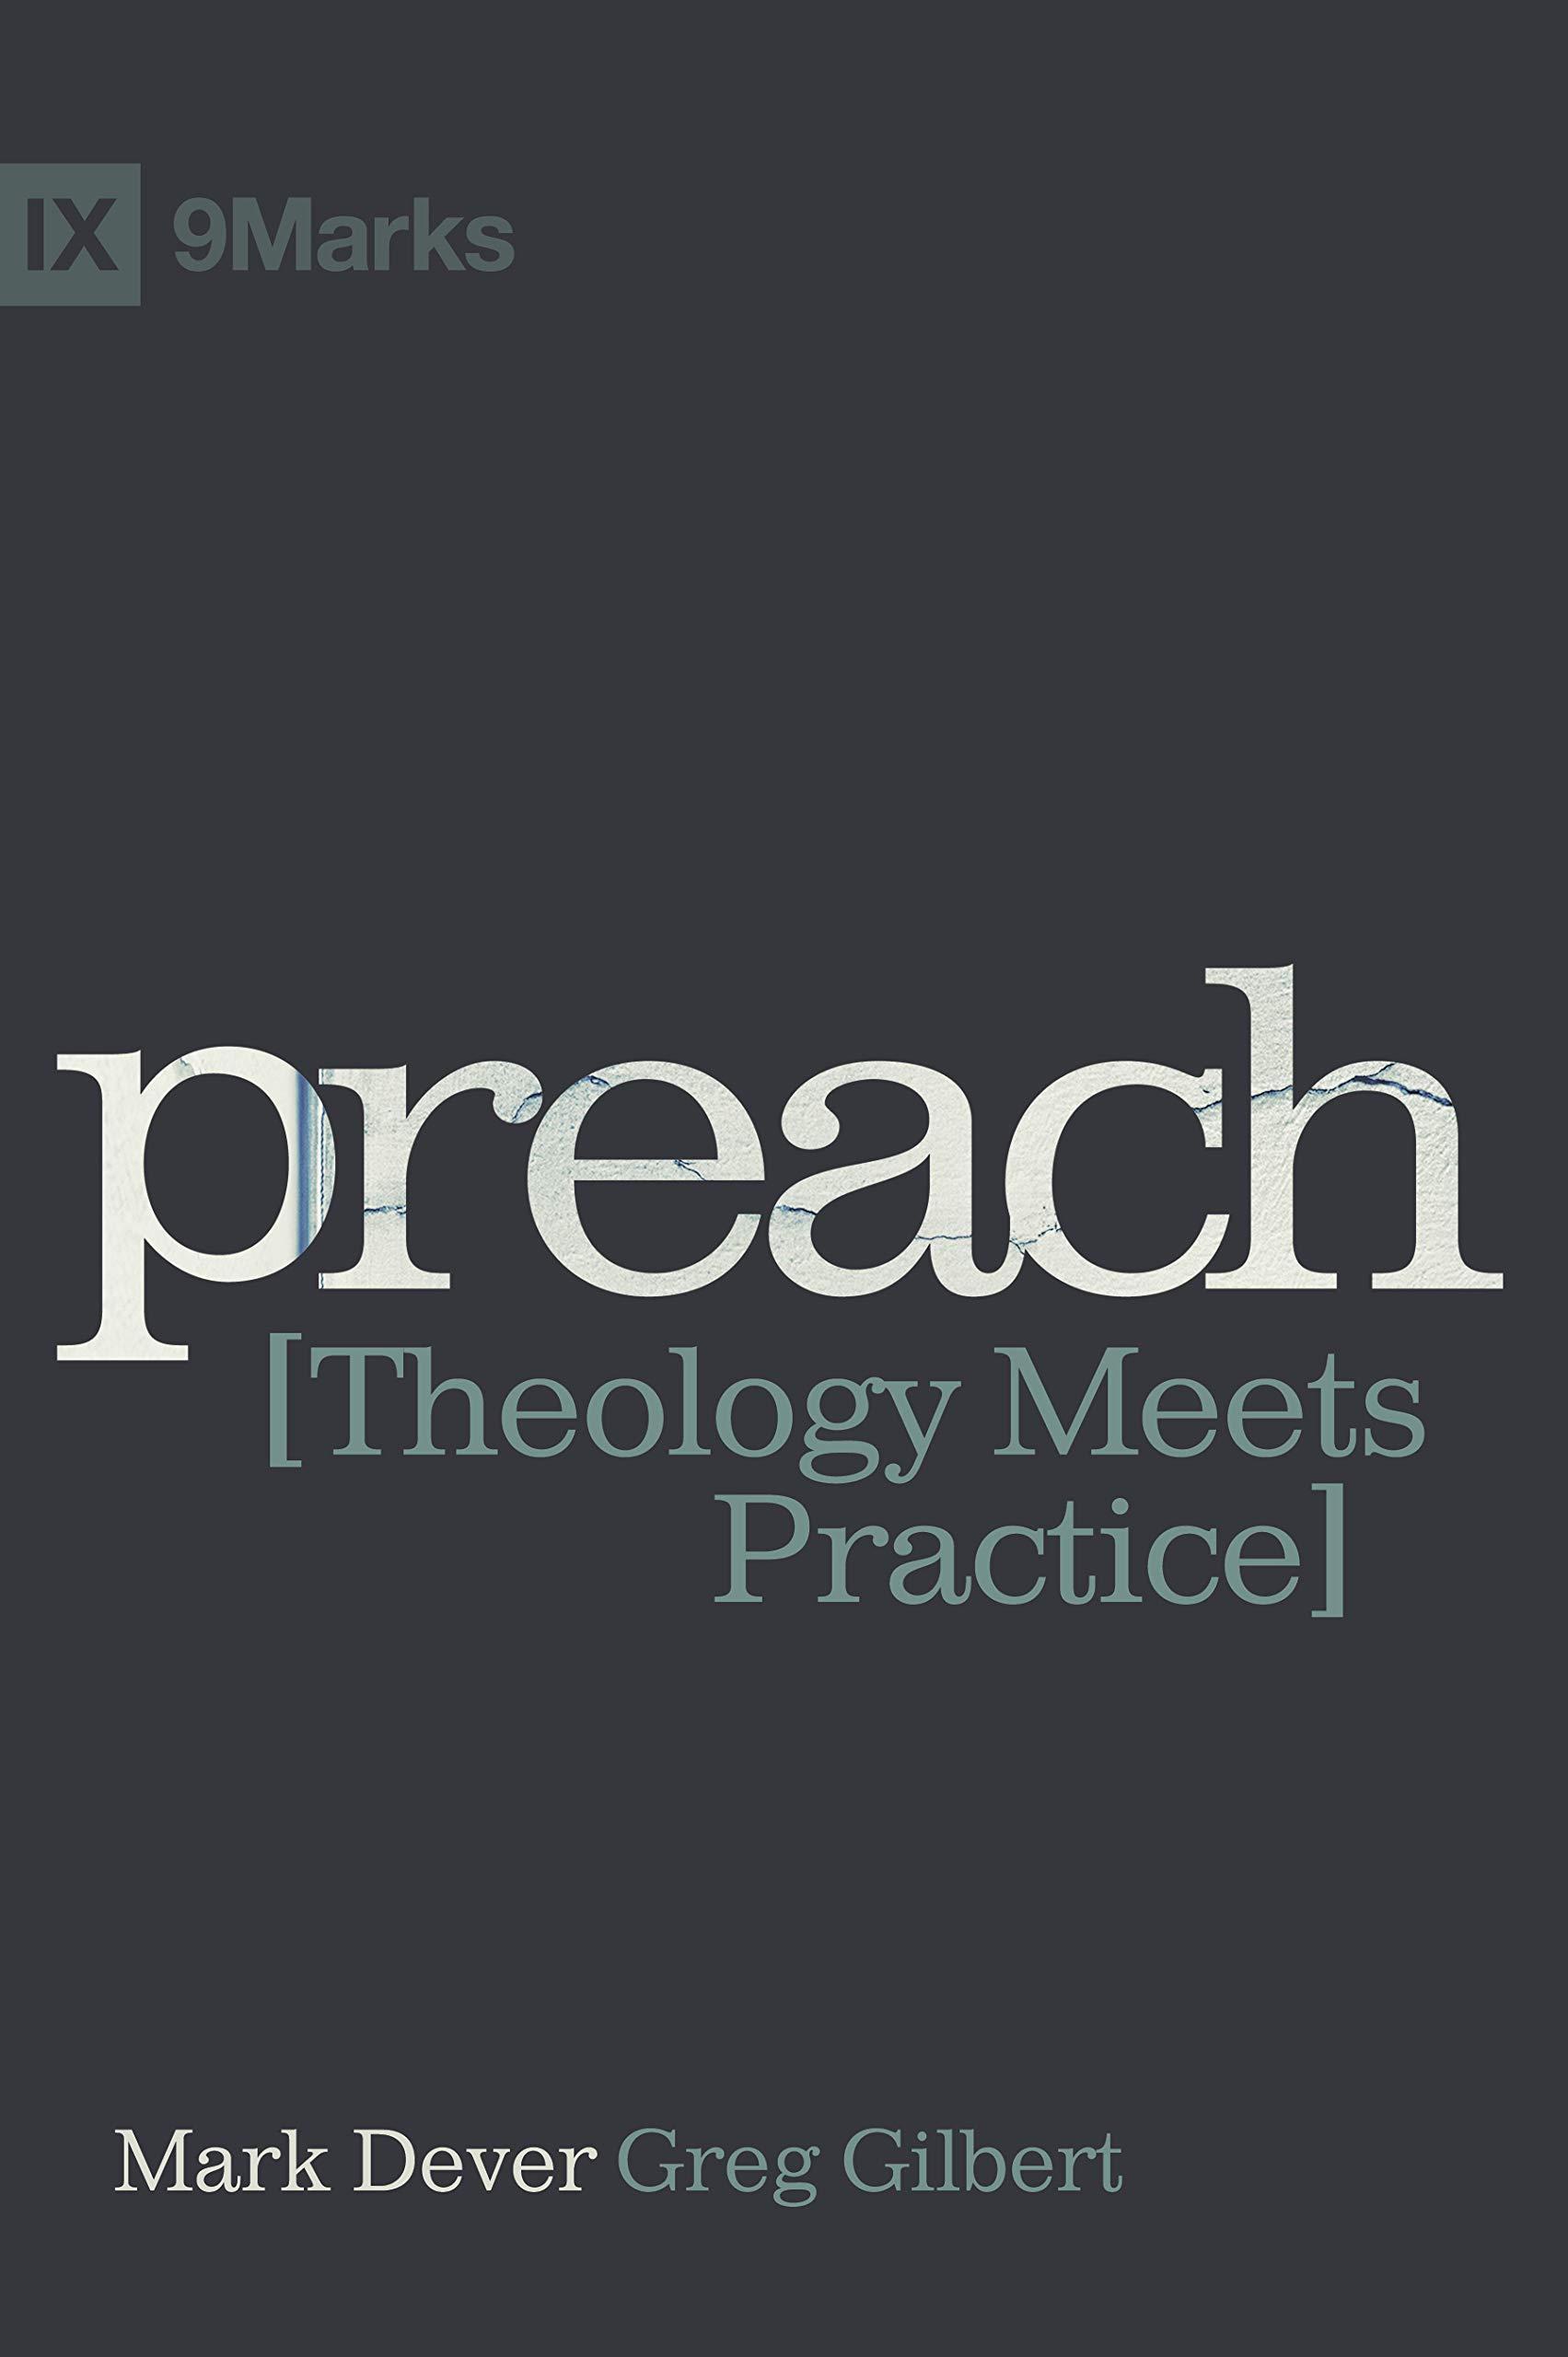 Preach: Theology Meets Practice (IX Marks) pdf epub